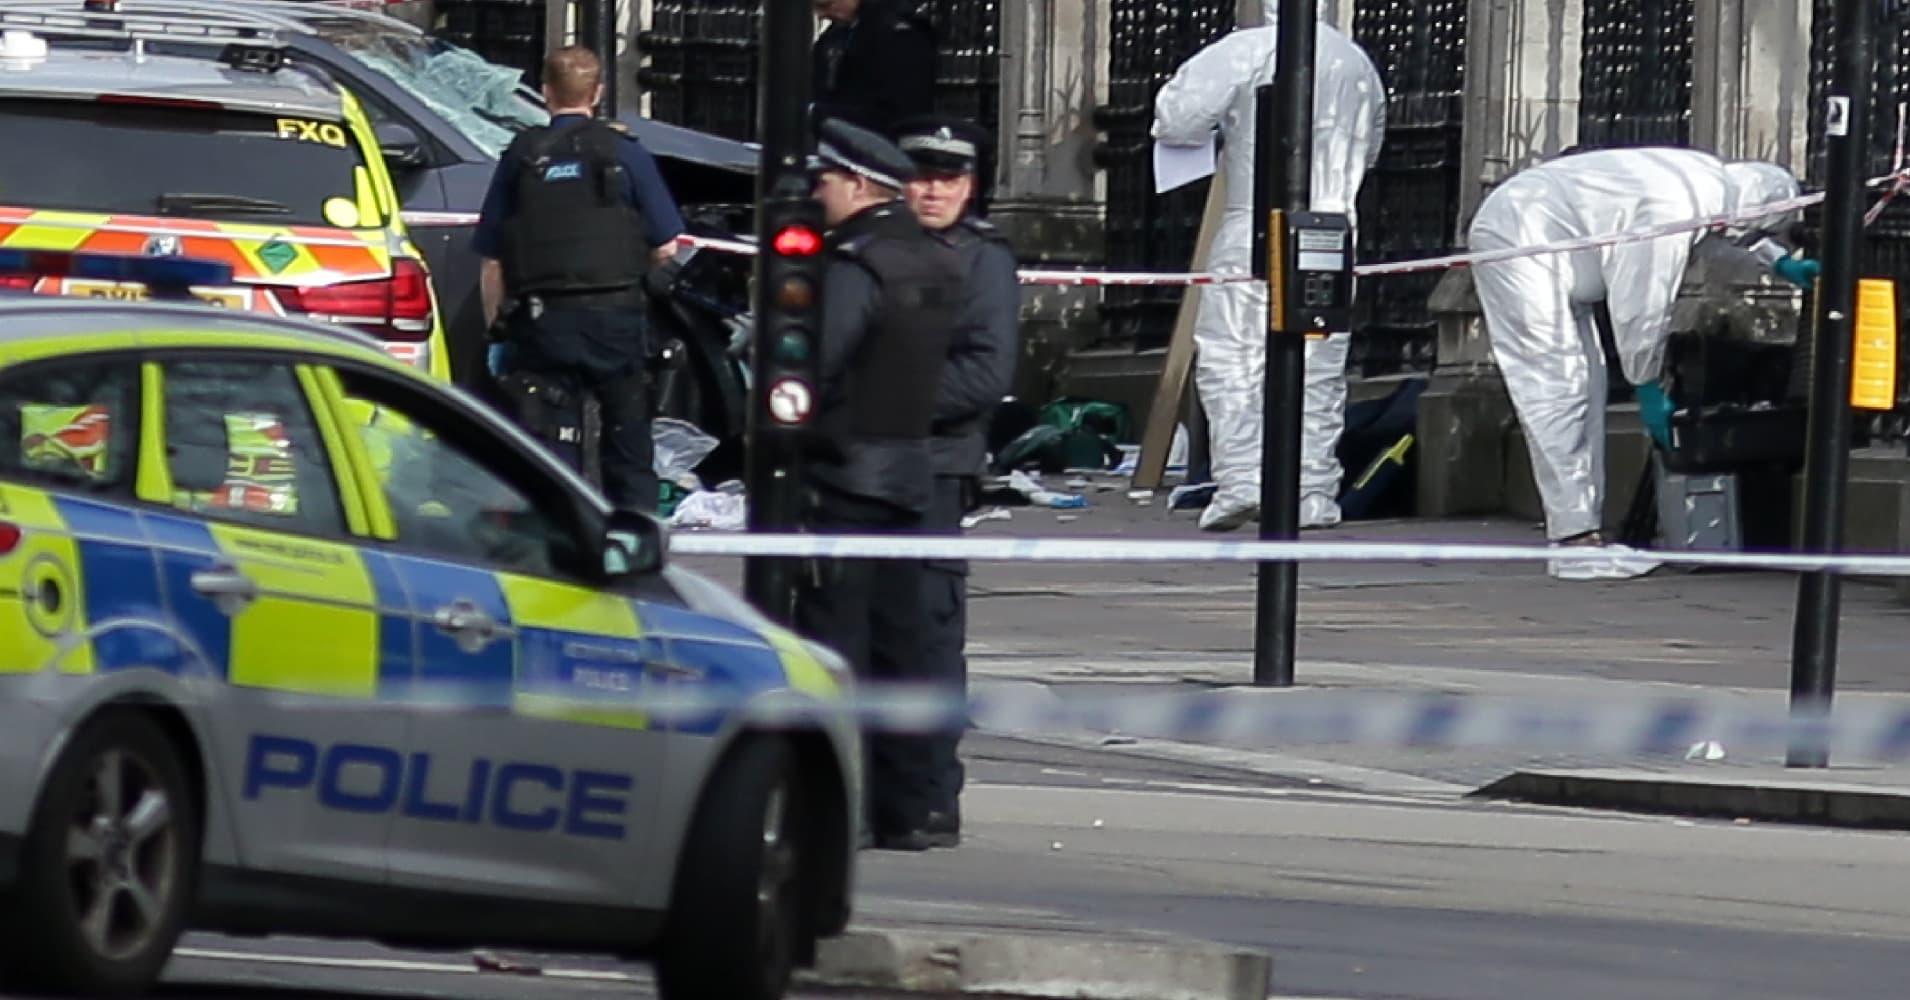 4 dead, including police officer, in London terrorist attack